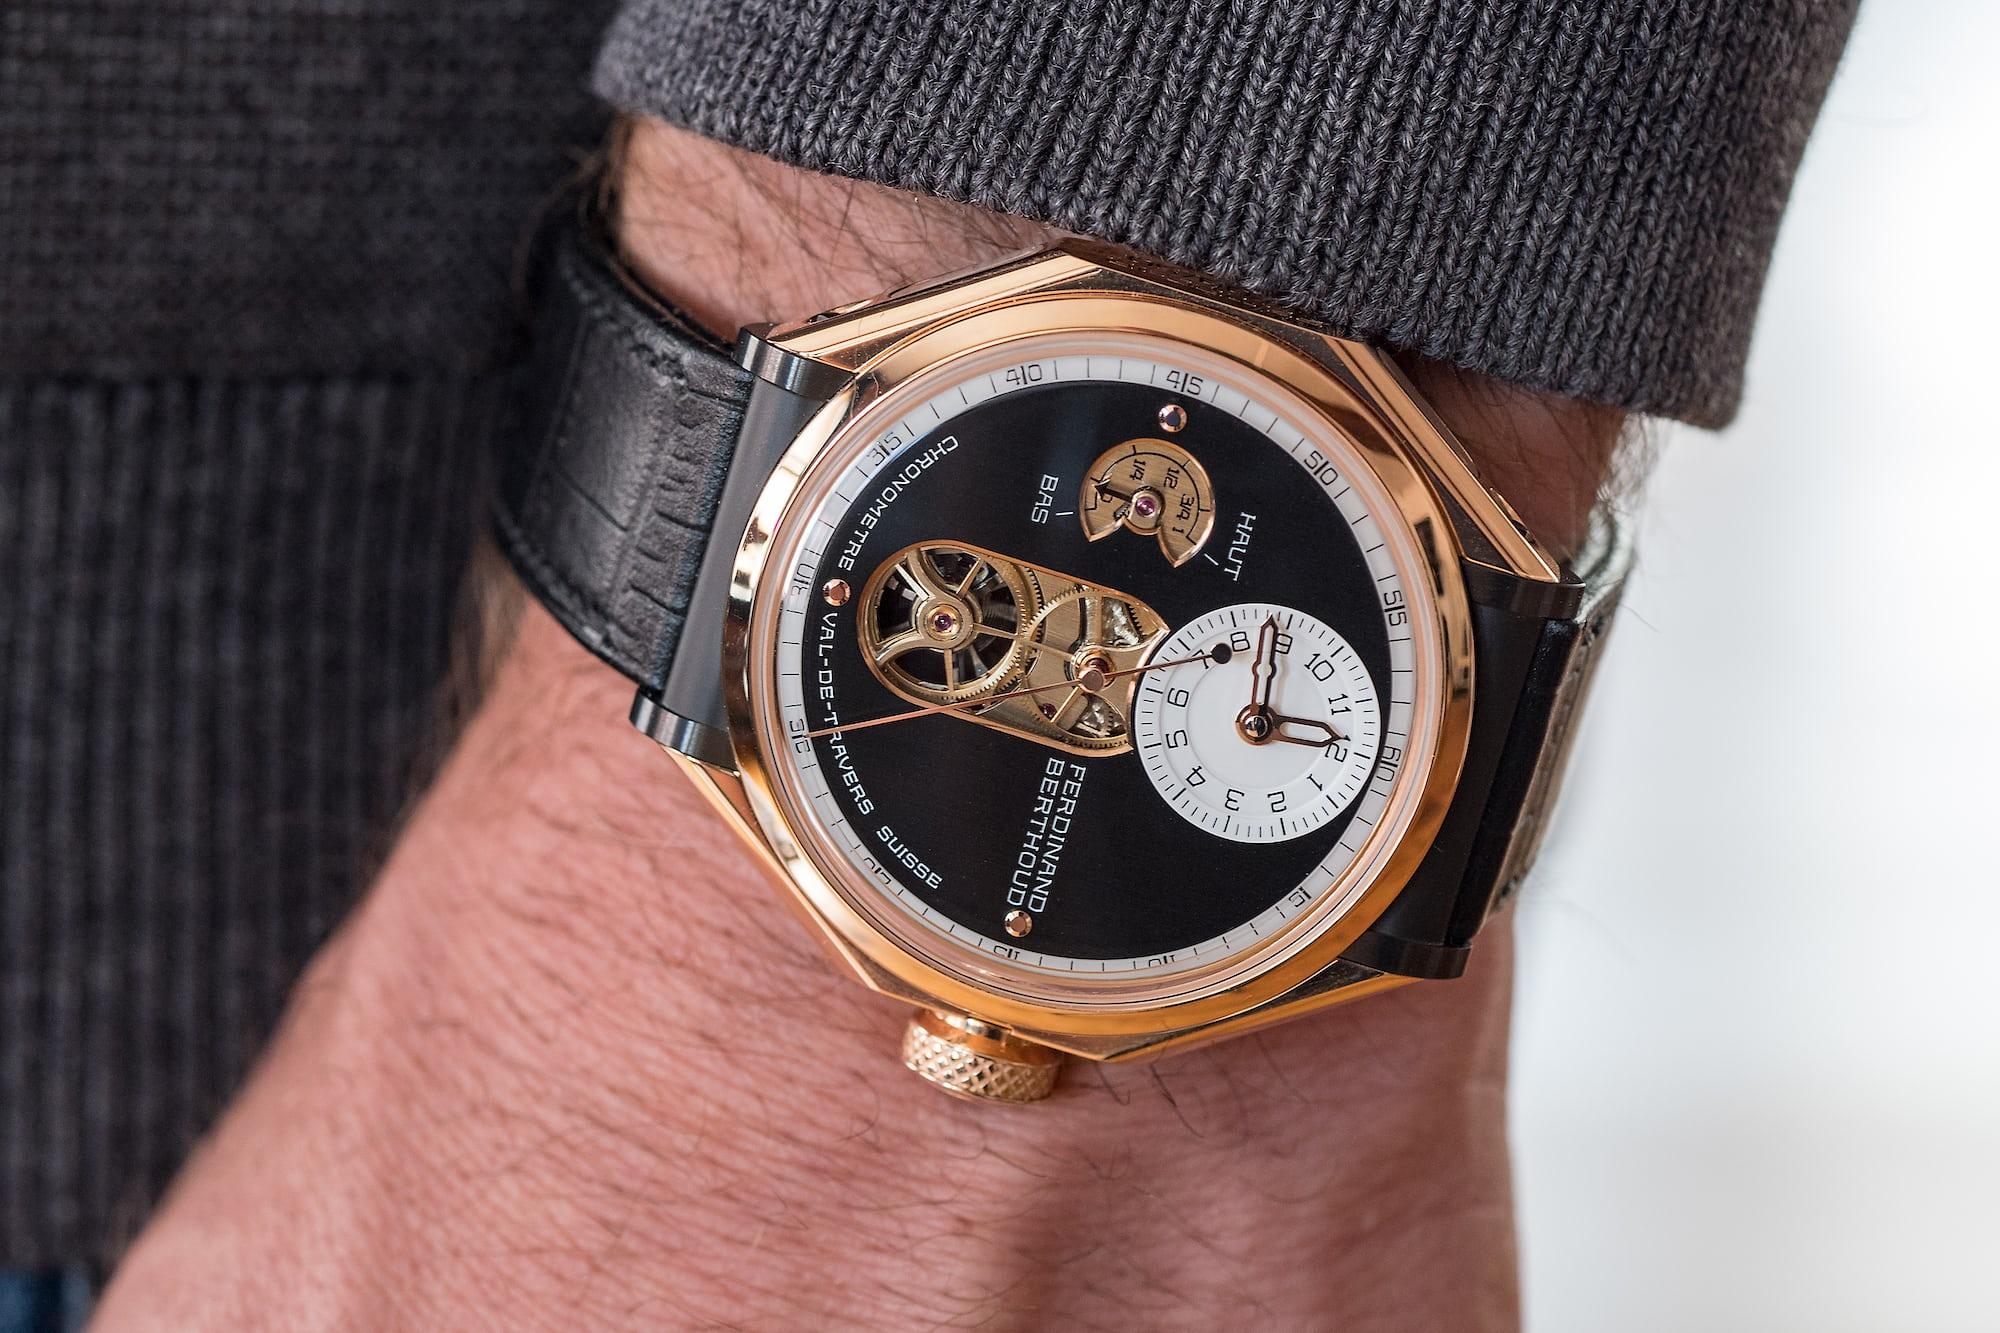 Chronomtre FB-1 wrist shot A Week On The Wrist: The Ferdinand Berthoud Chronomtre FB 1 A Week On The Wrist: The Ferdinand Berthoud Chronomtre FB 1 P7100470